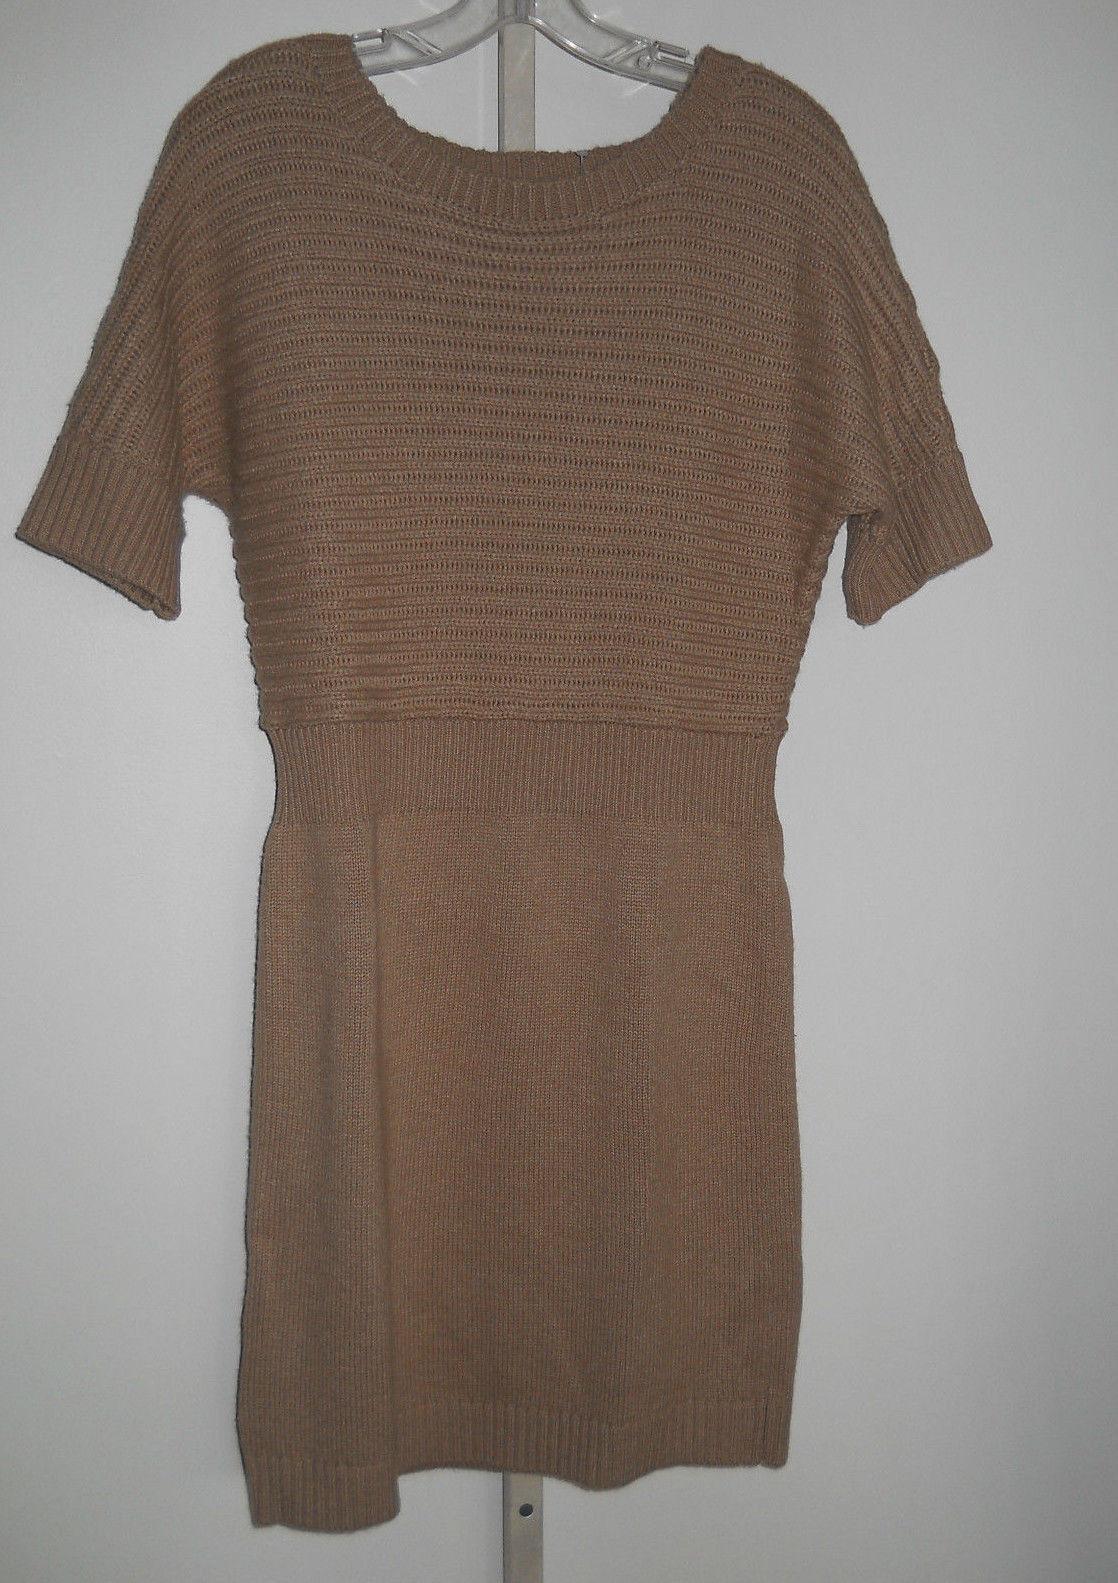 Ann Taylor Loft Short Sleeve Sweater Dress Fisherman Rib Brown S | eBay